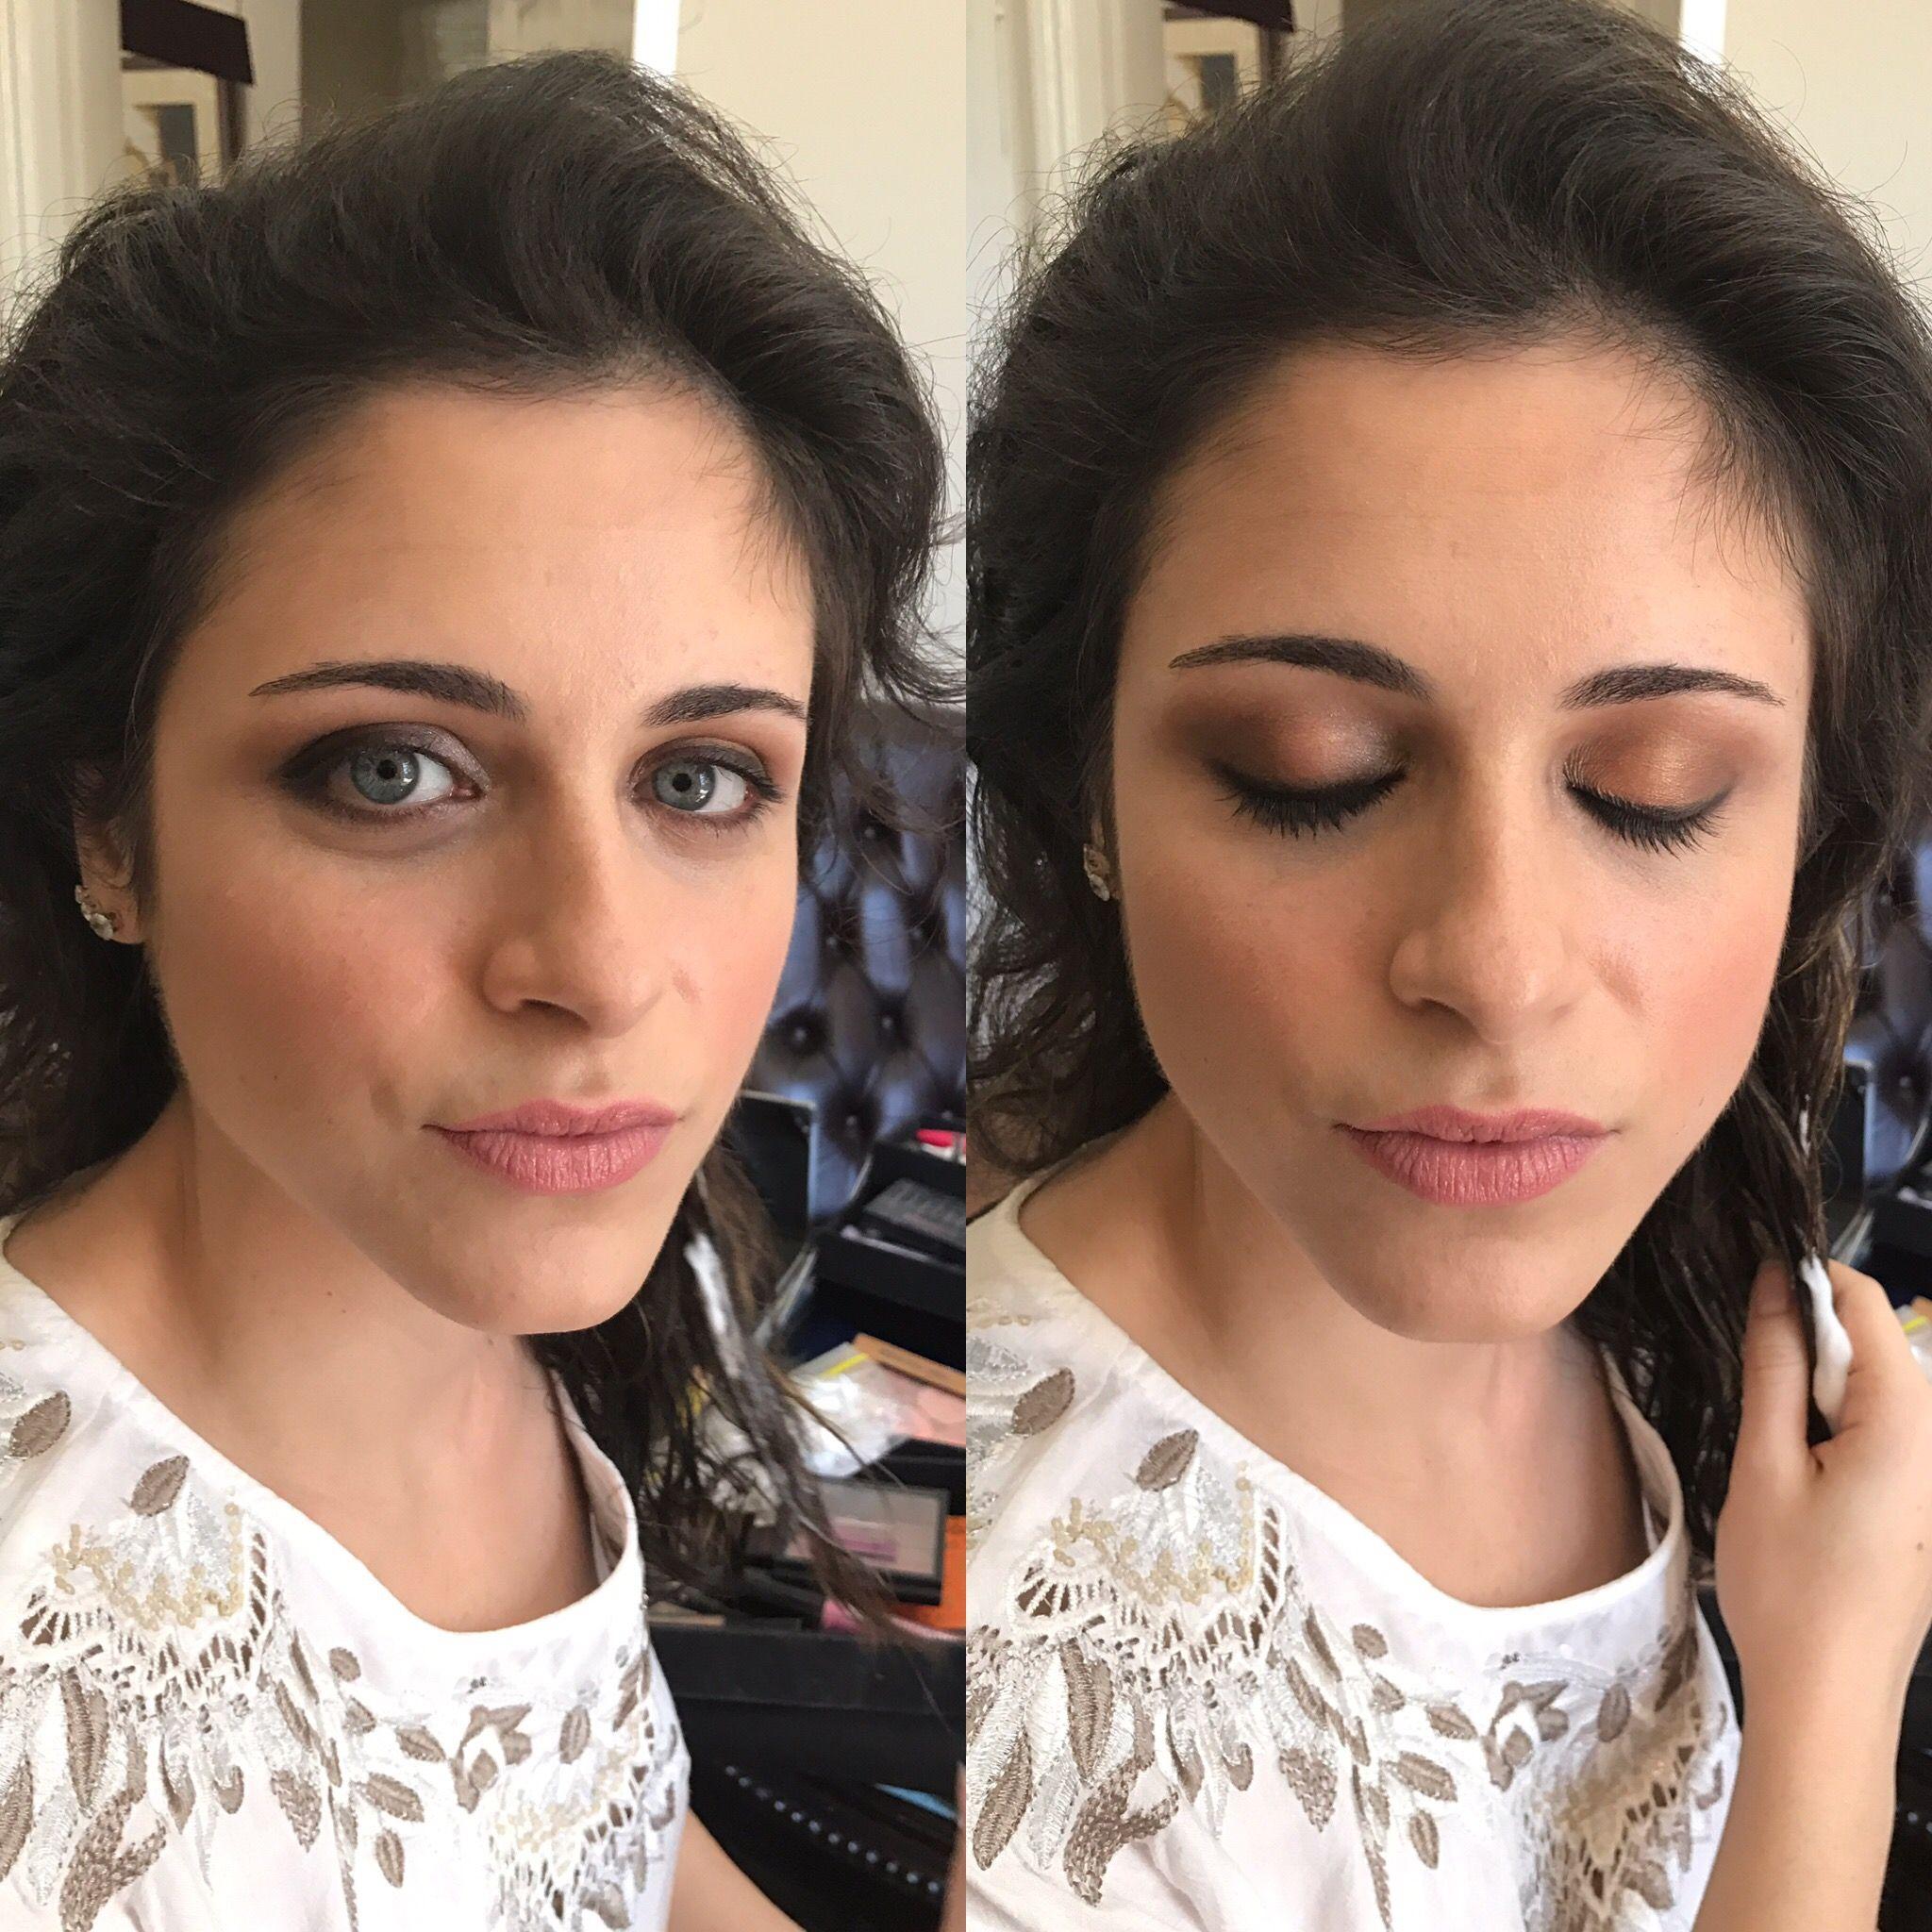 Bridal Hair and Makeup Bridal hair and makeup, Bridal